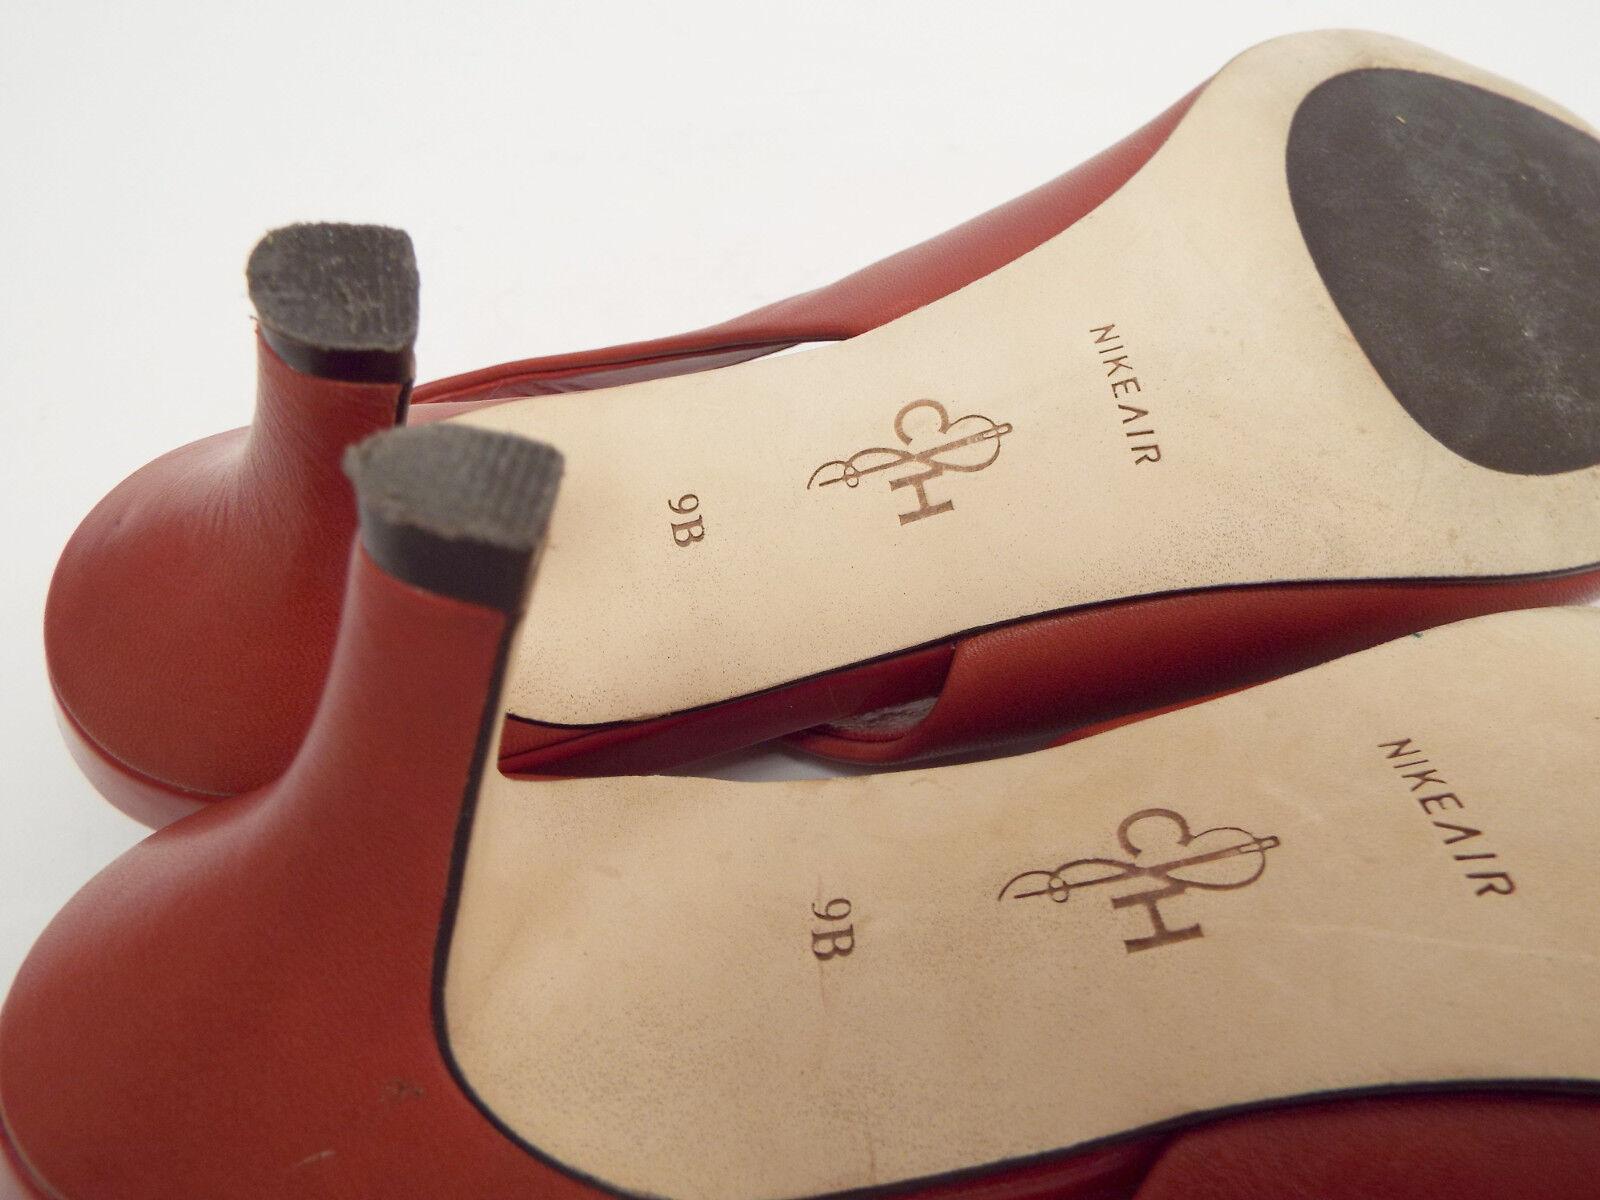 COLE HAAN Größe 9 Pumps ROT Leder Slingback Heels Pumps 9 Schuhes N. Air fc9271